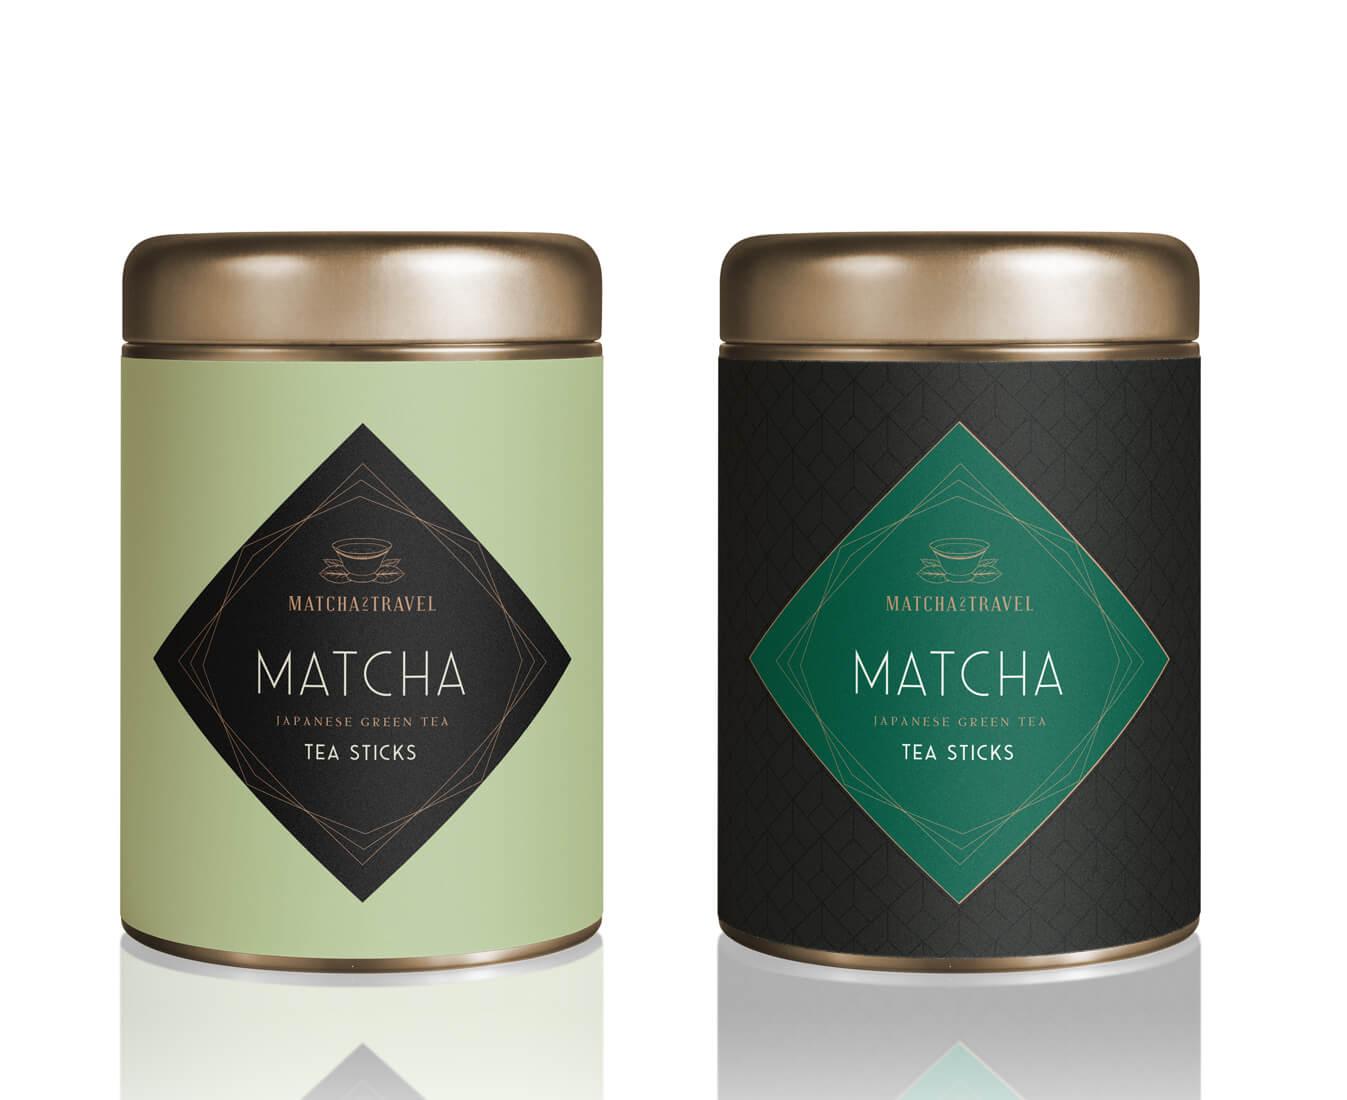 Verpackungsdesign Dose Matcha edel Matcha2Travel